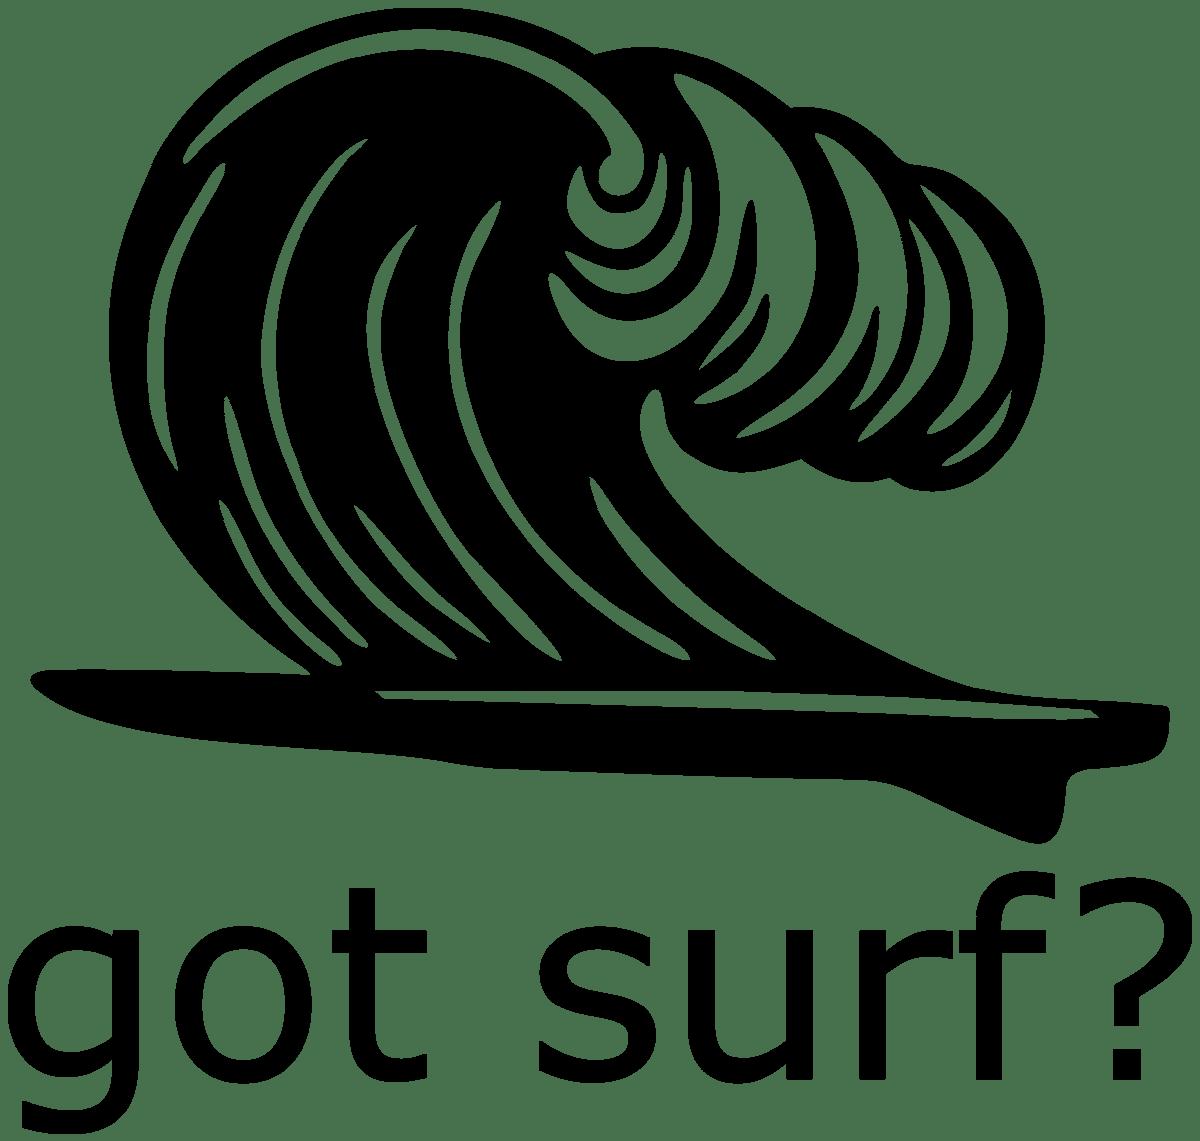 Wandtattoos: Flowsurf04